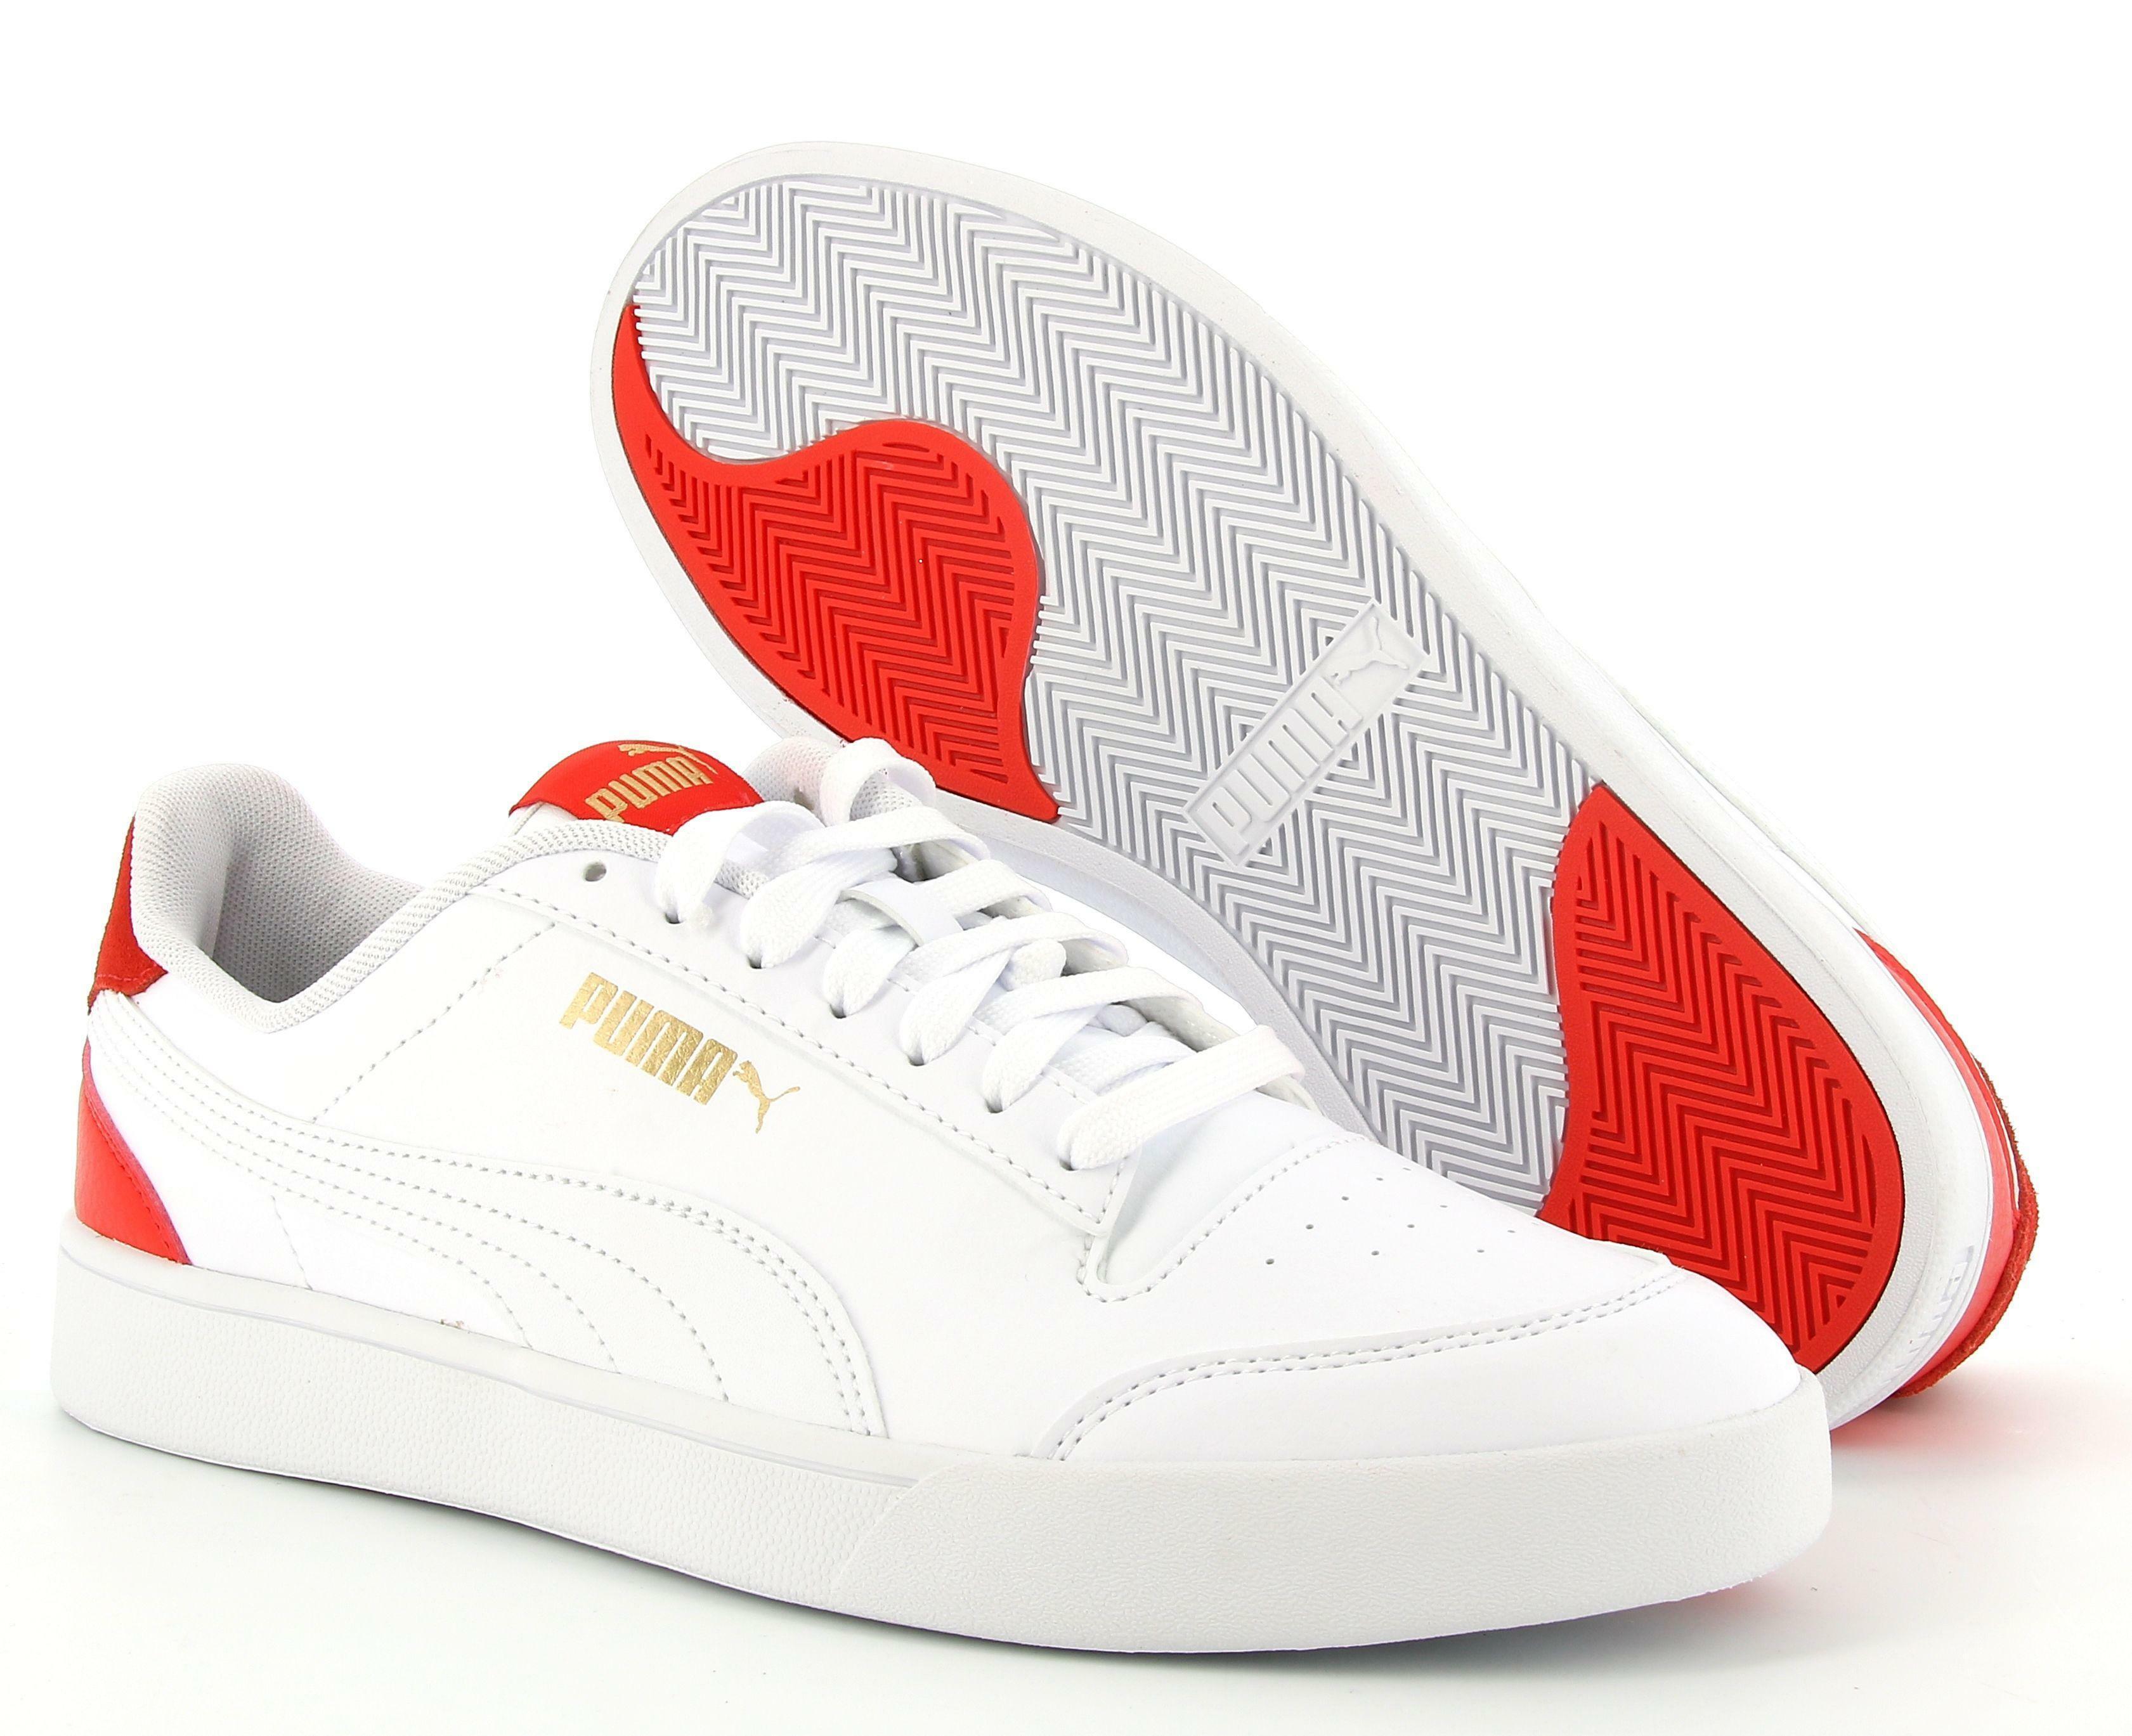 puma puma shuffle 309668 006 sneaker bassa uomo bianca